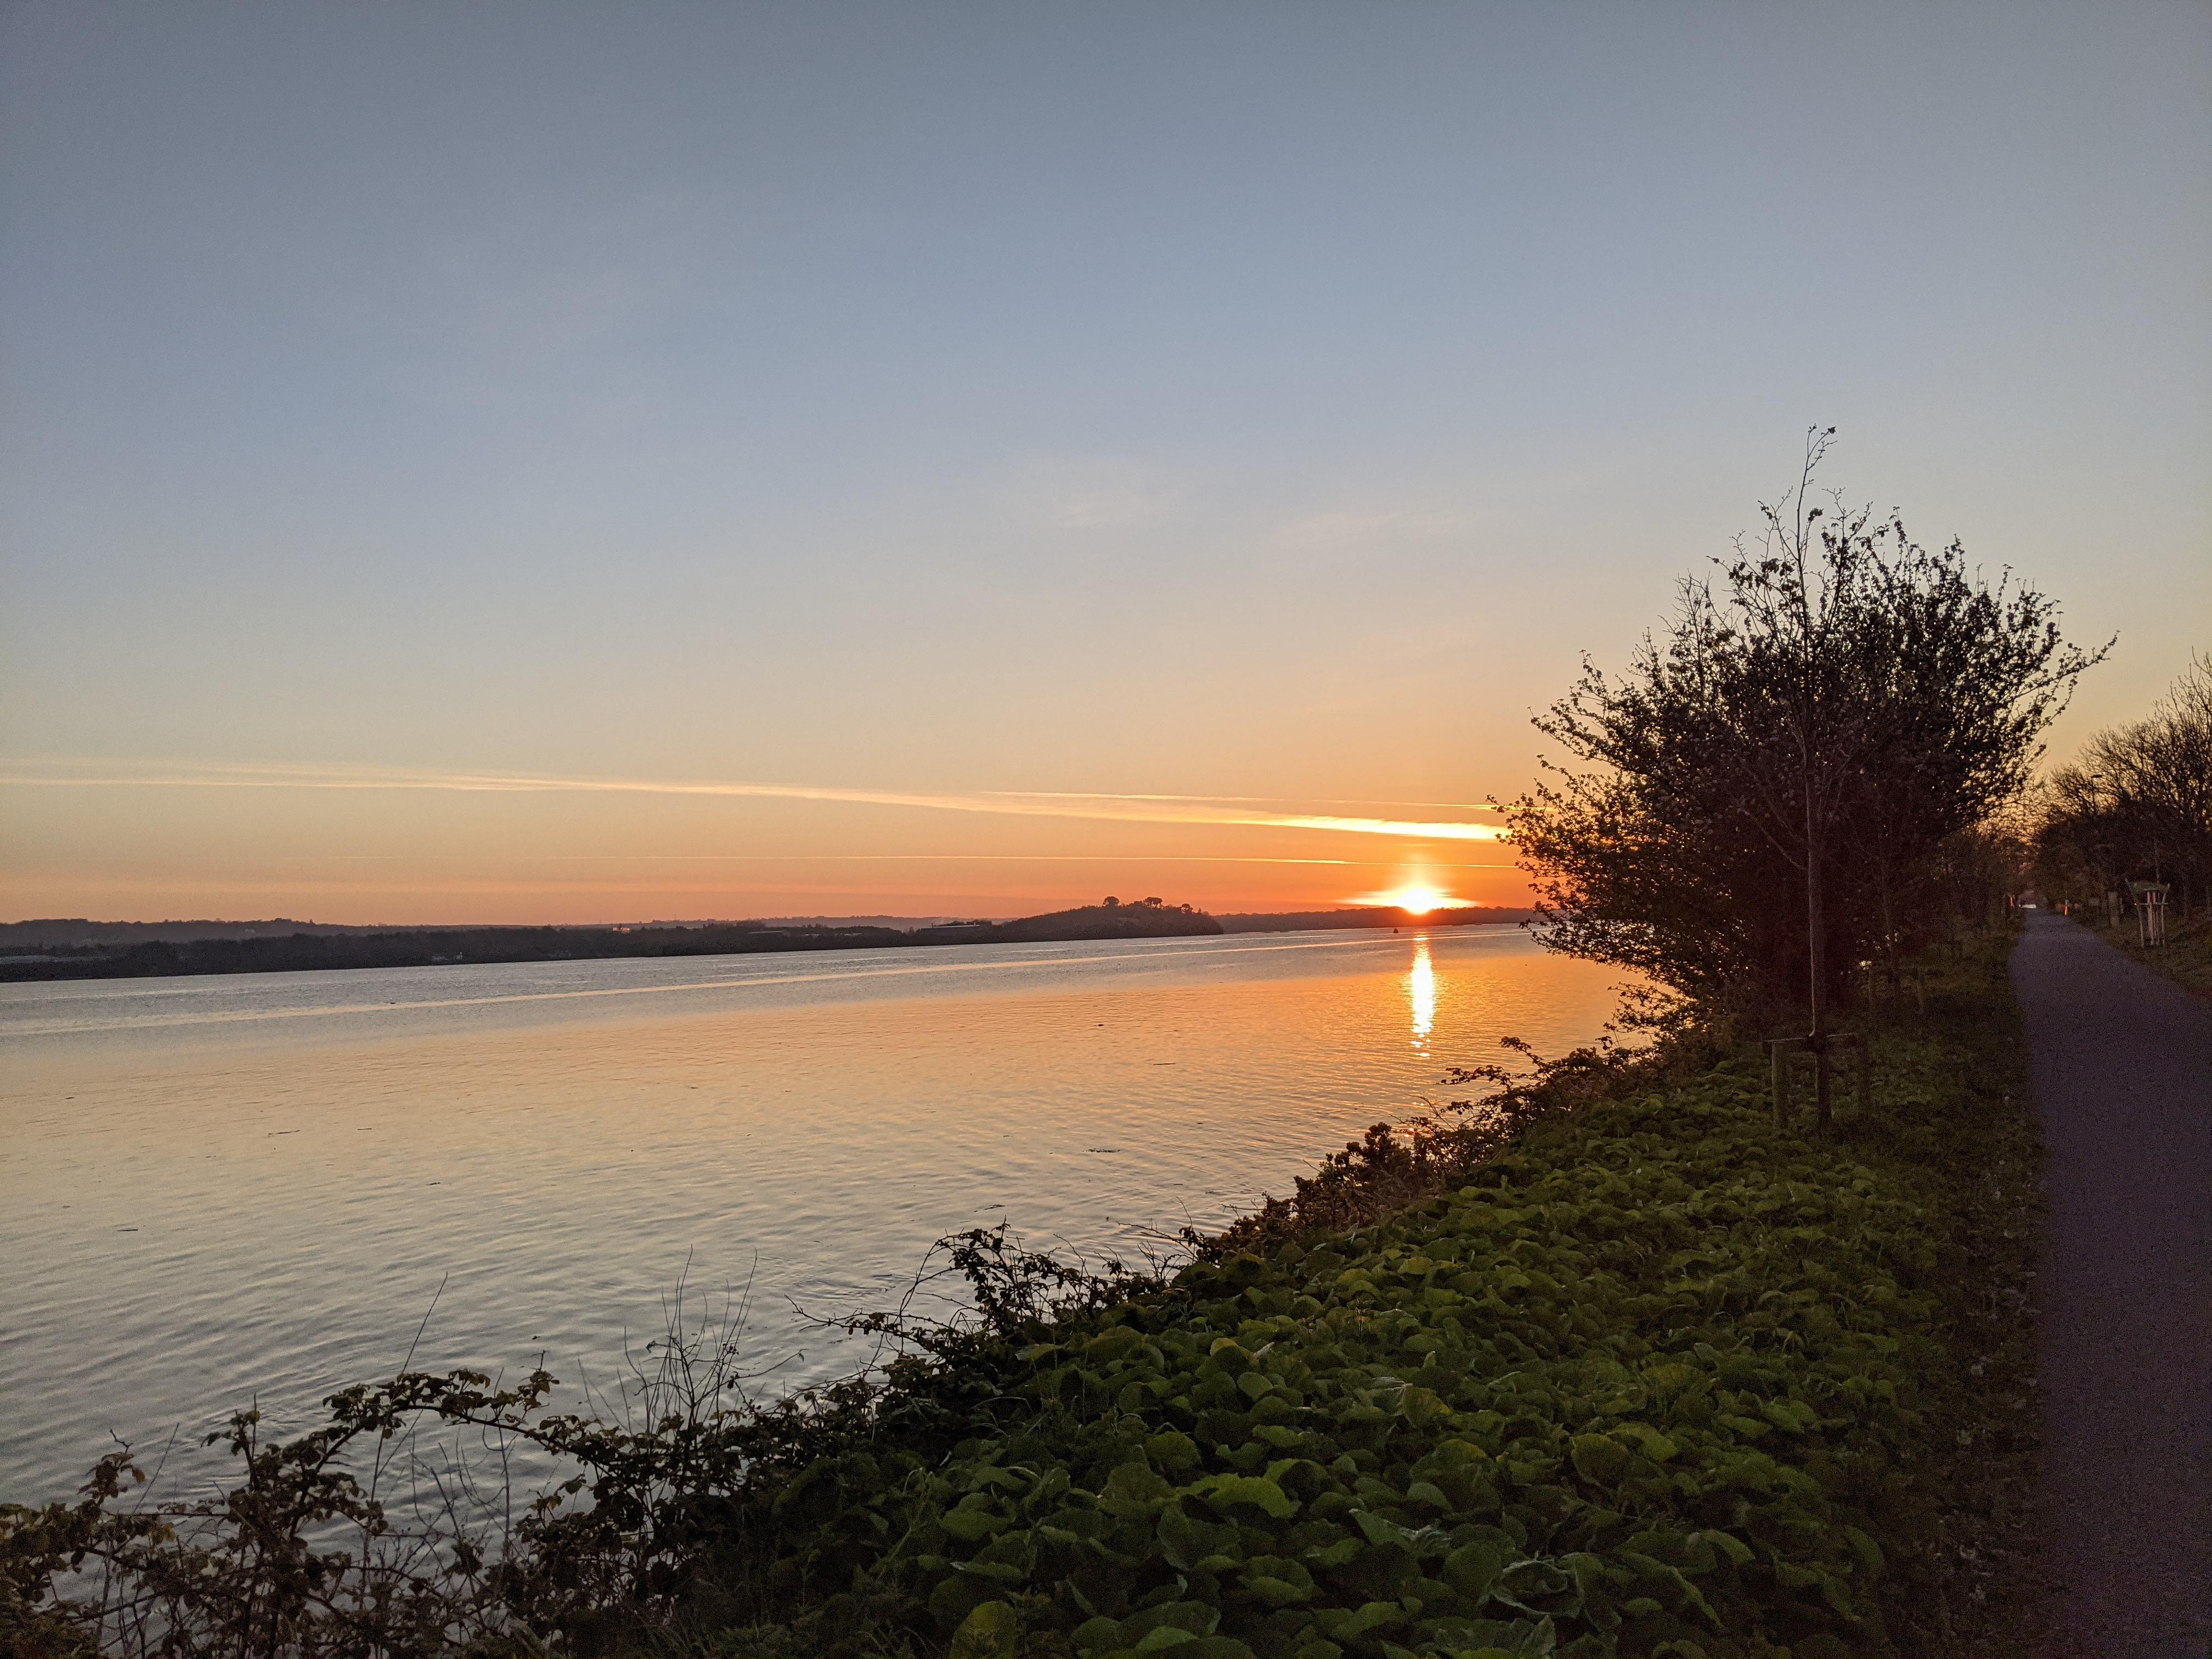 Sunrise seen from Hop Island, Cork